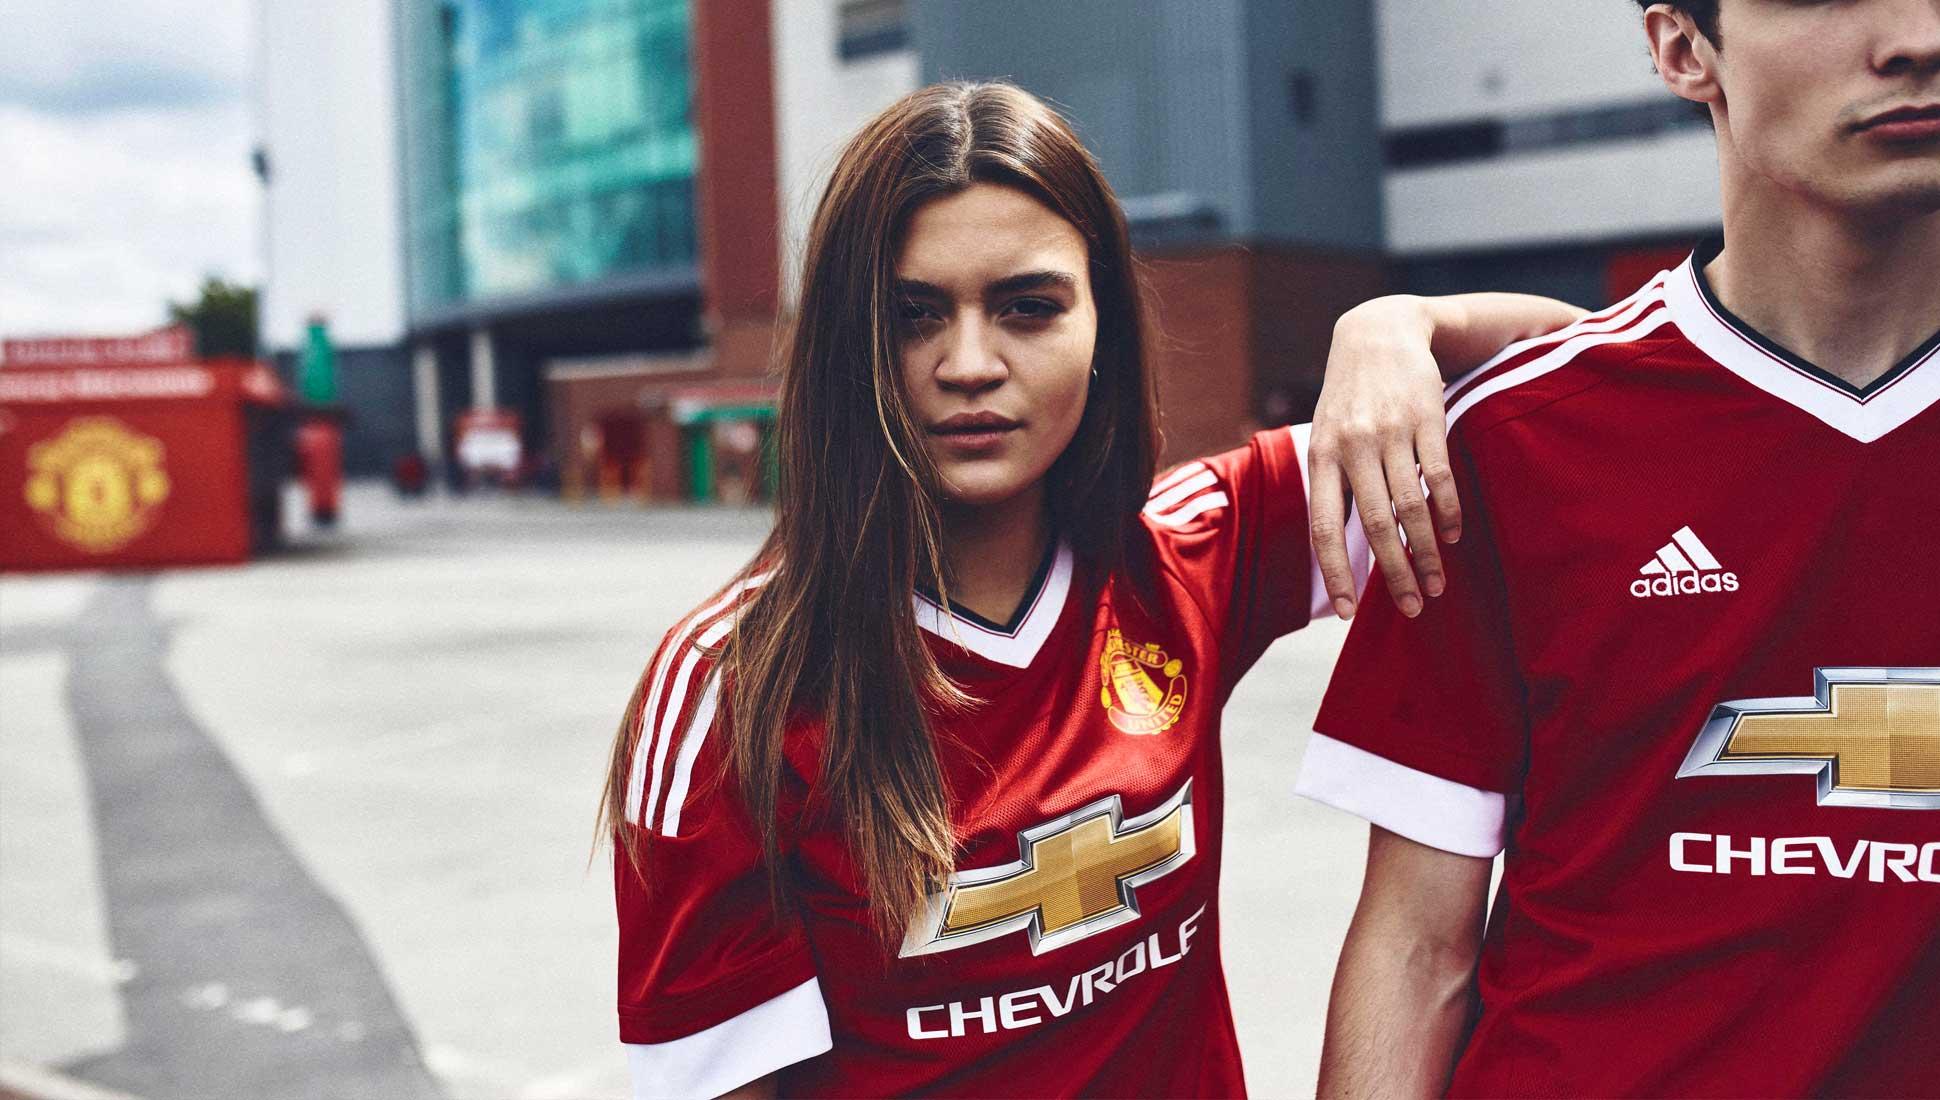 sale retailer 198dd 1aeed Man Utd Shirts 2015 16 - DREAMWORKS